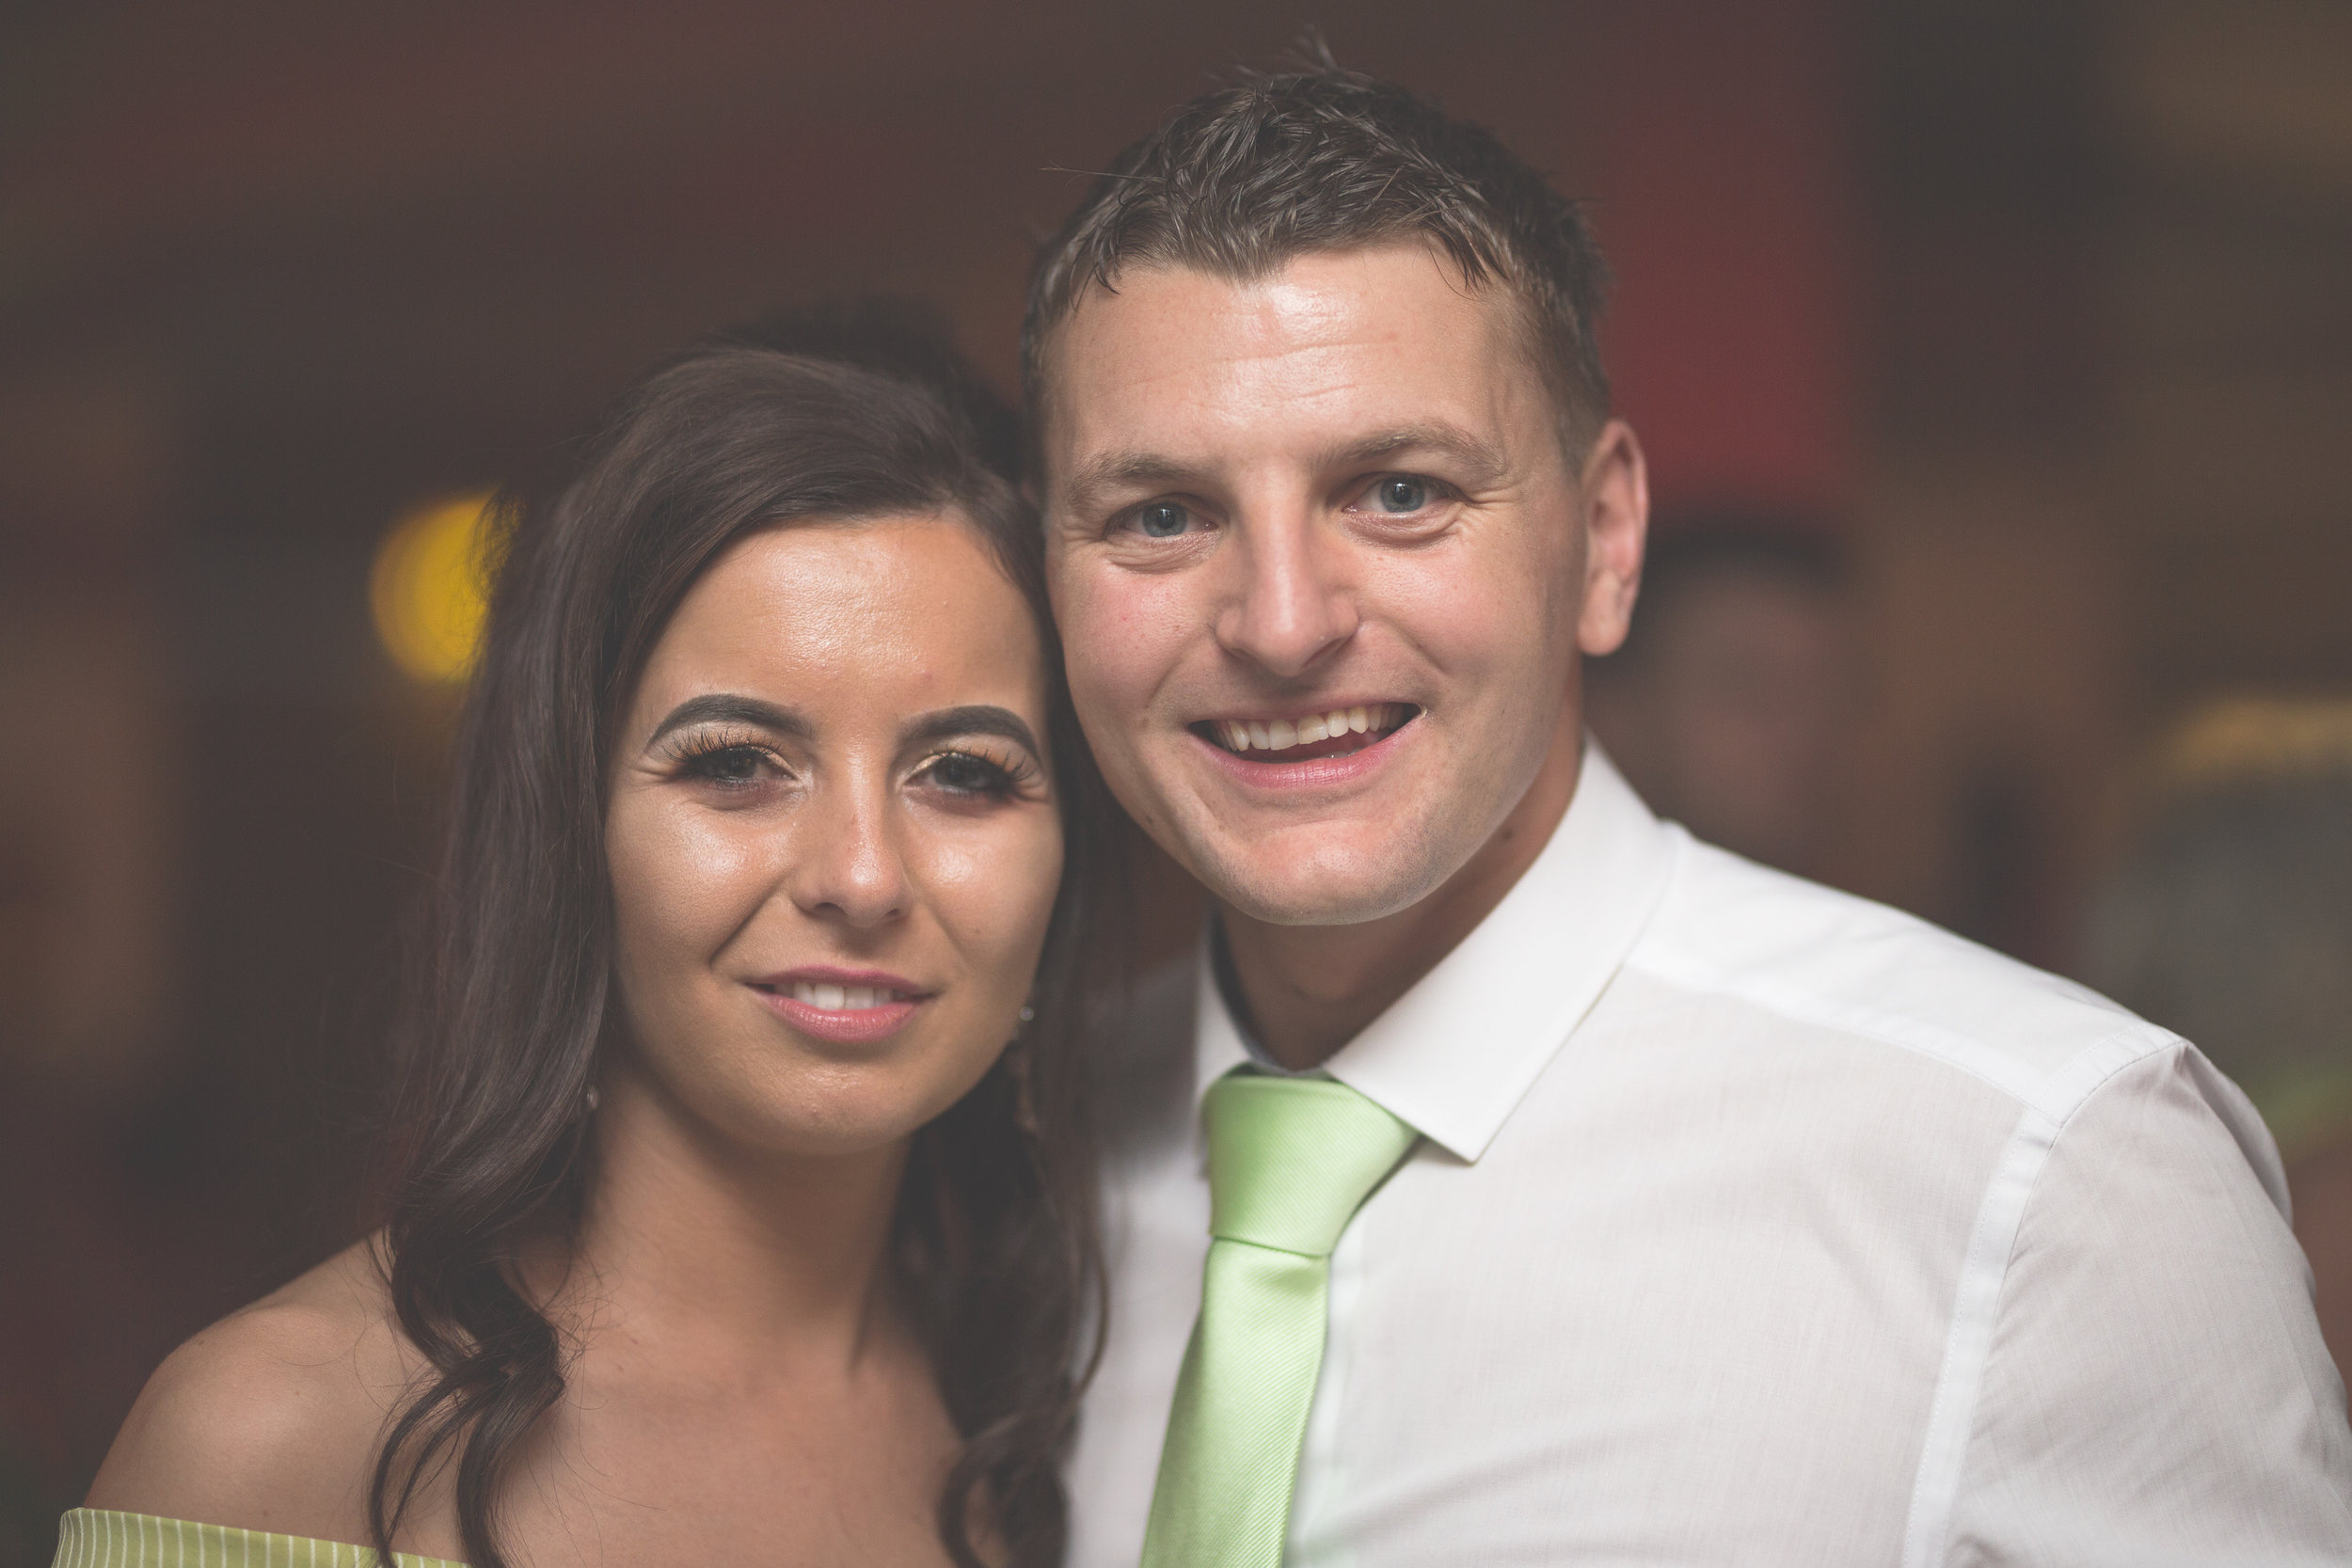 Antoinette & Stephen - First Dance | Brian McEwan Photography | Wedding Photographer Northern Ireland 71.jpg